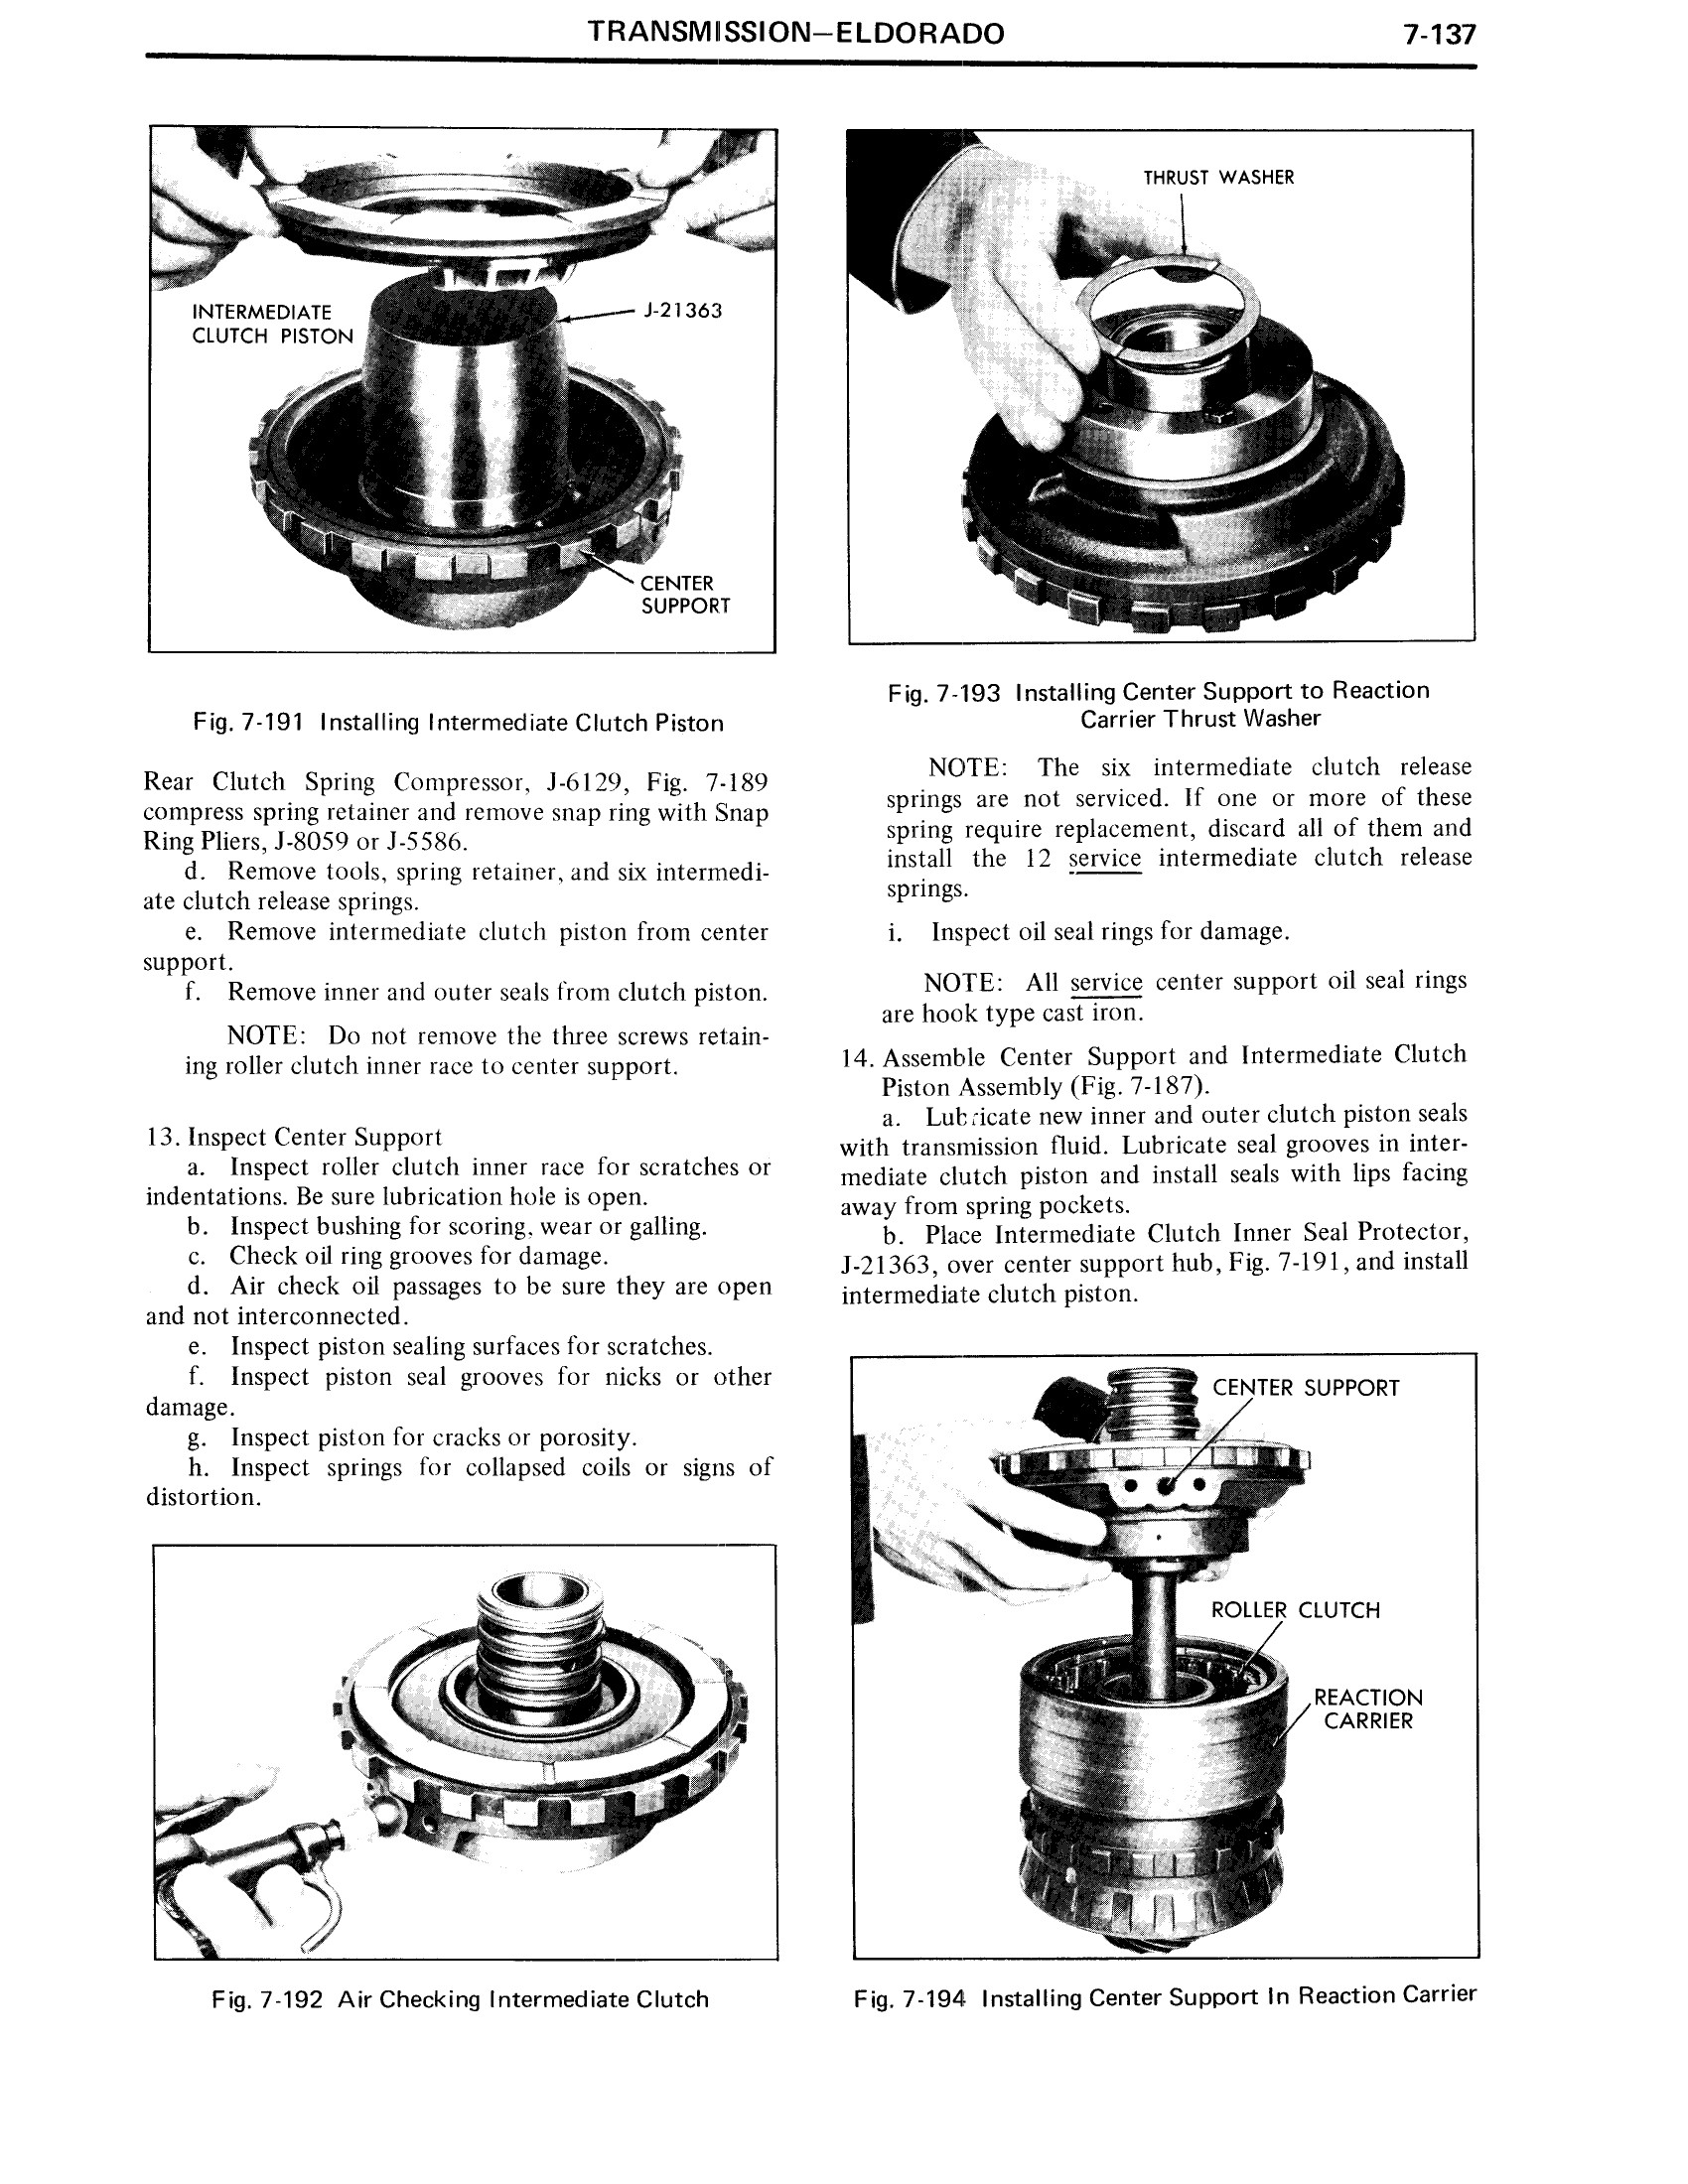 1971 Cadillac Shop Manual- Transmission Page 137 of 156